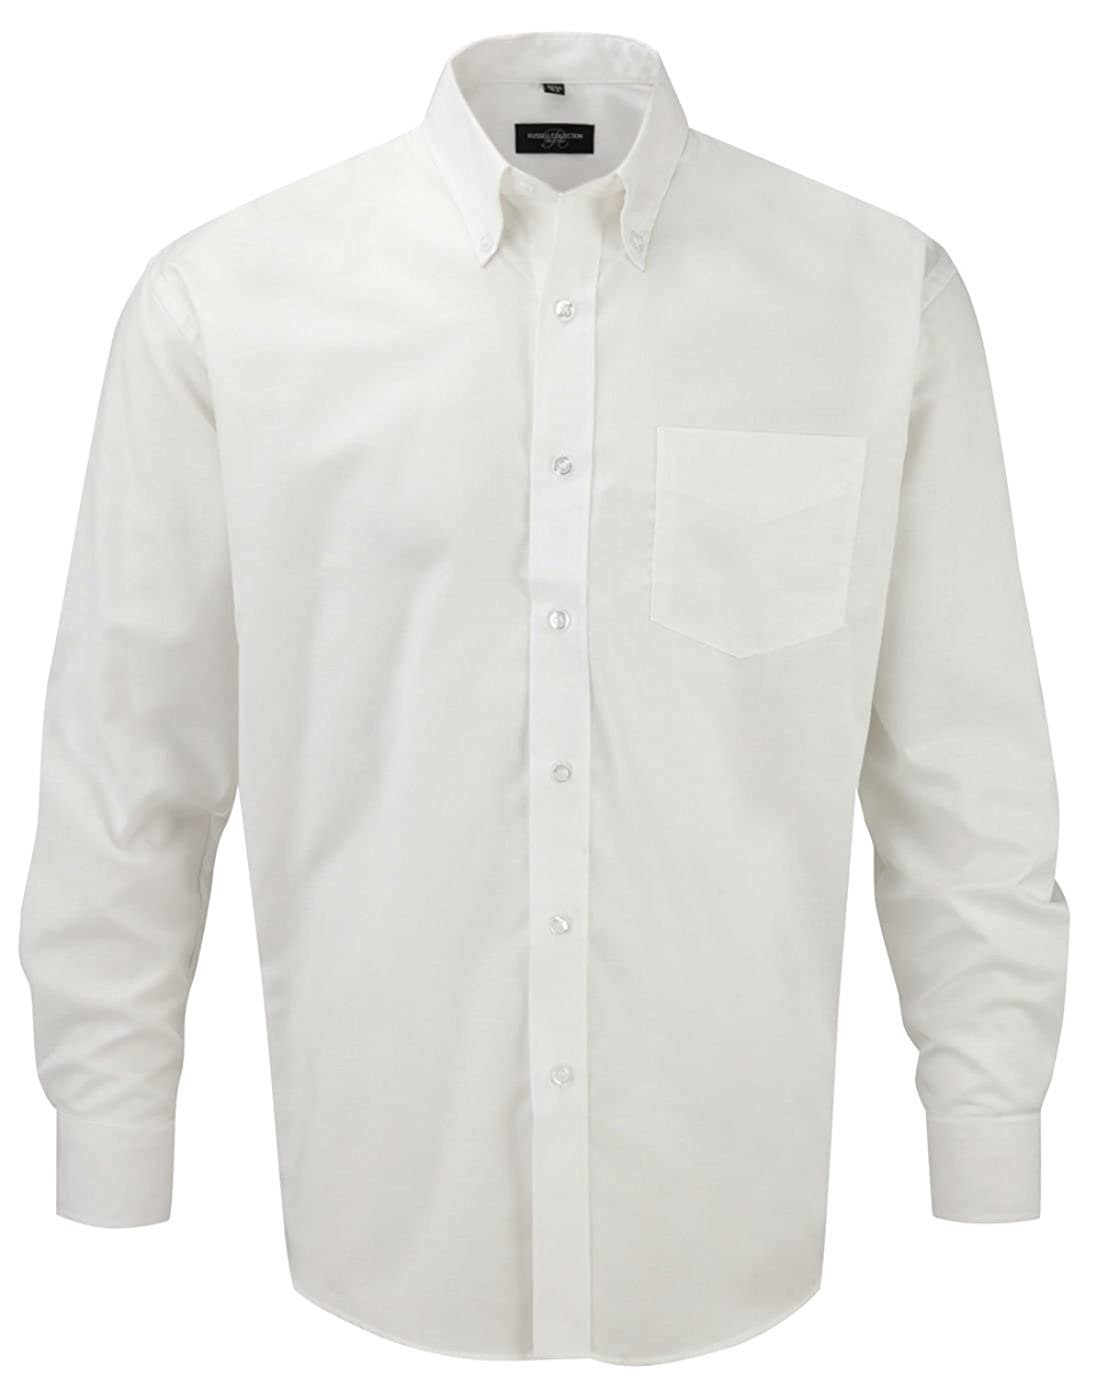 TALLA 4XL. Russell Collection Hombre Camisa De Manga Larga, fácil